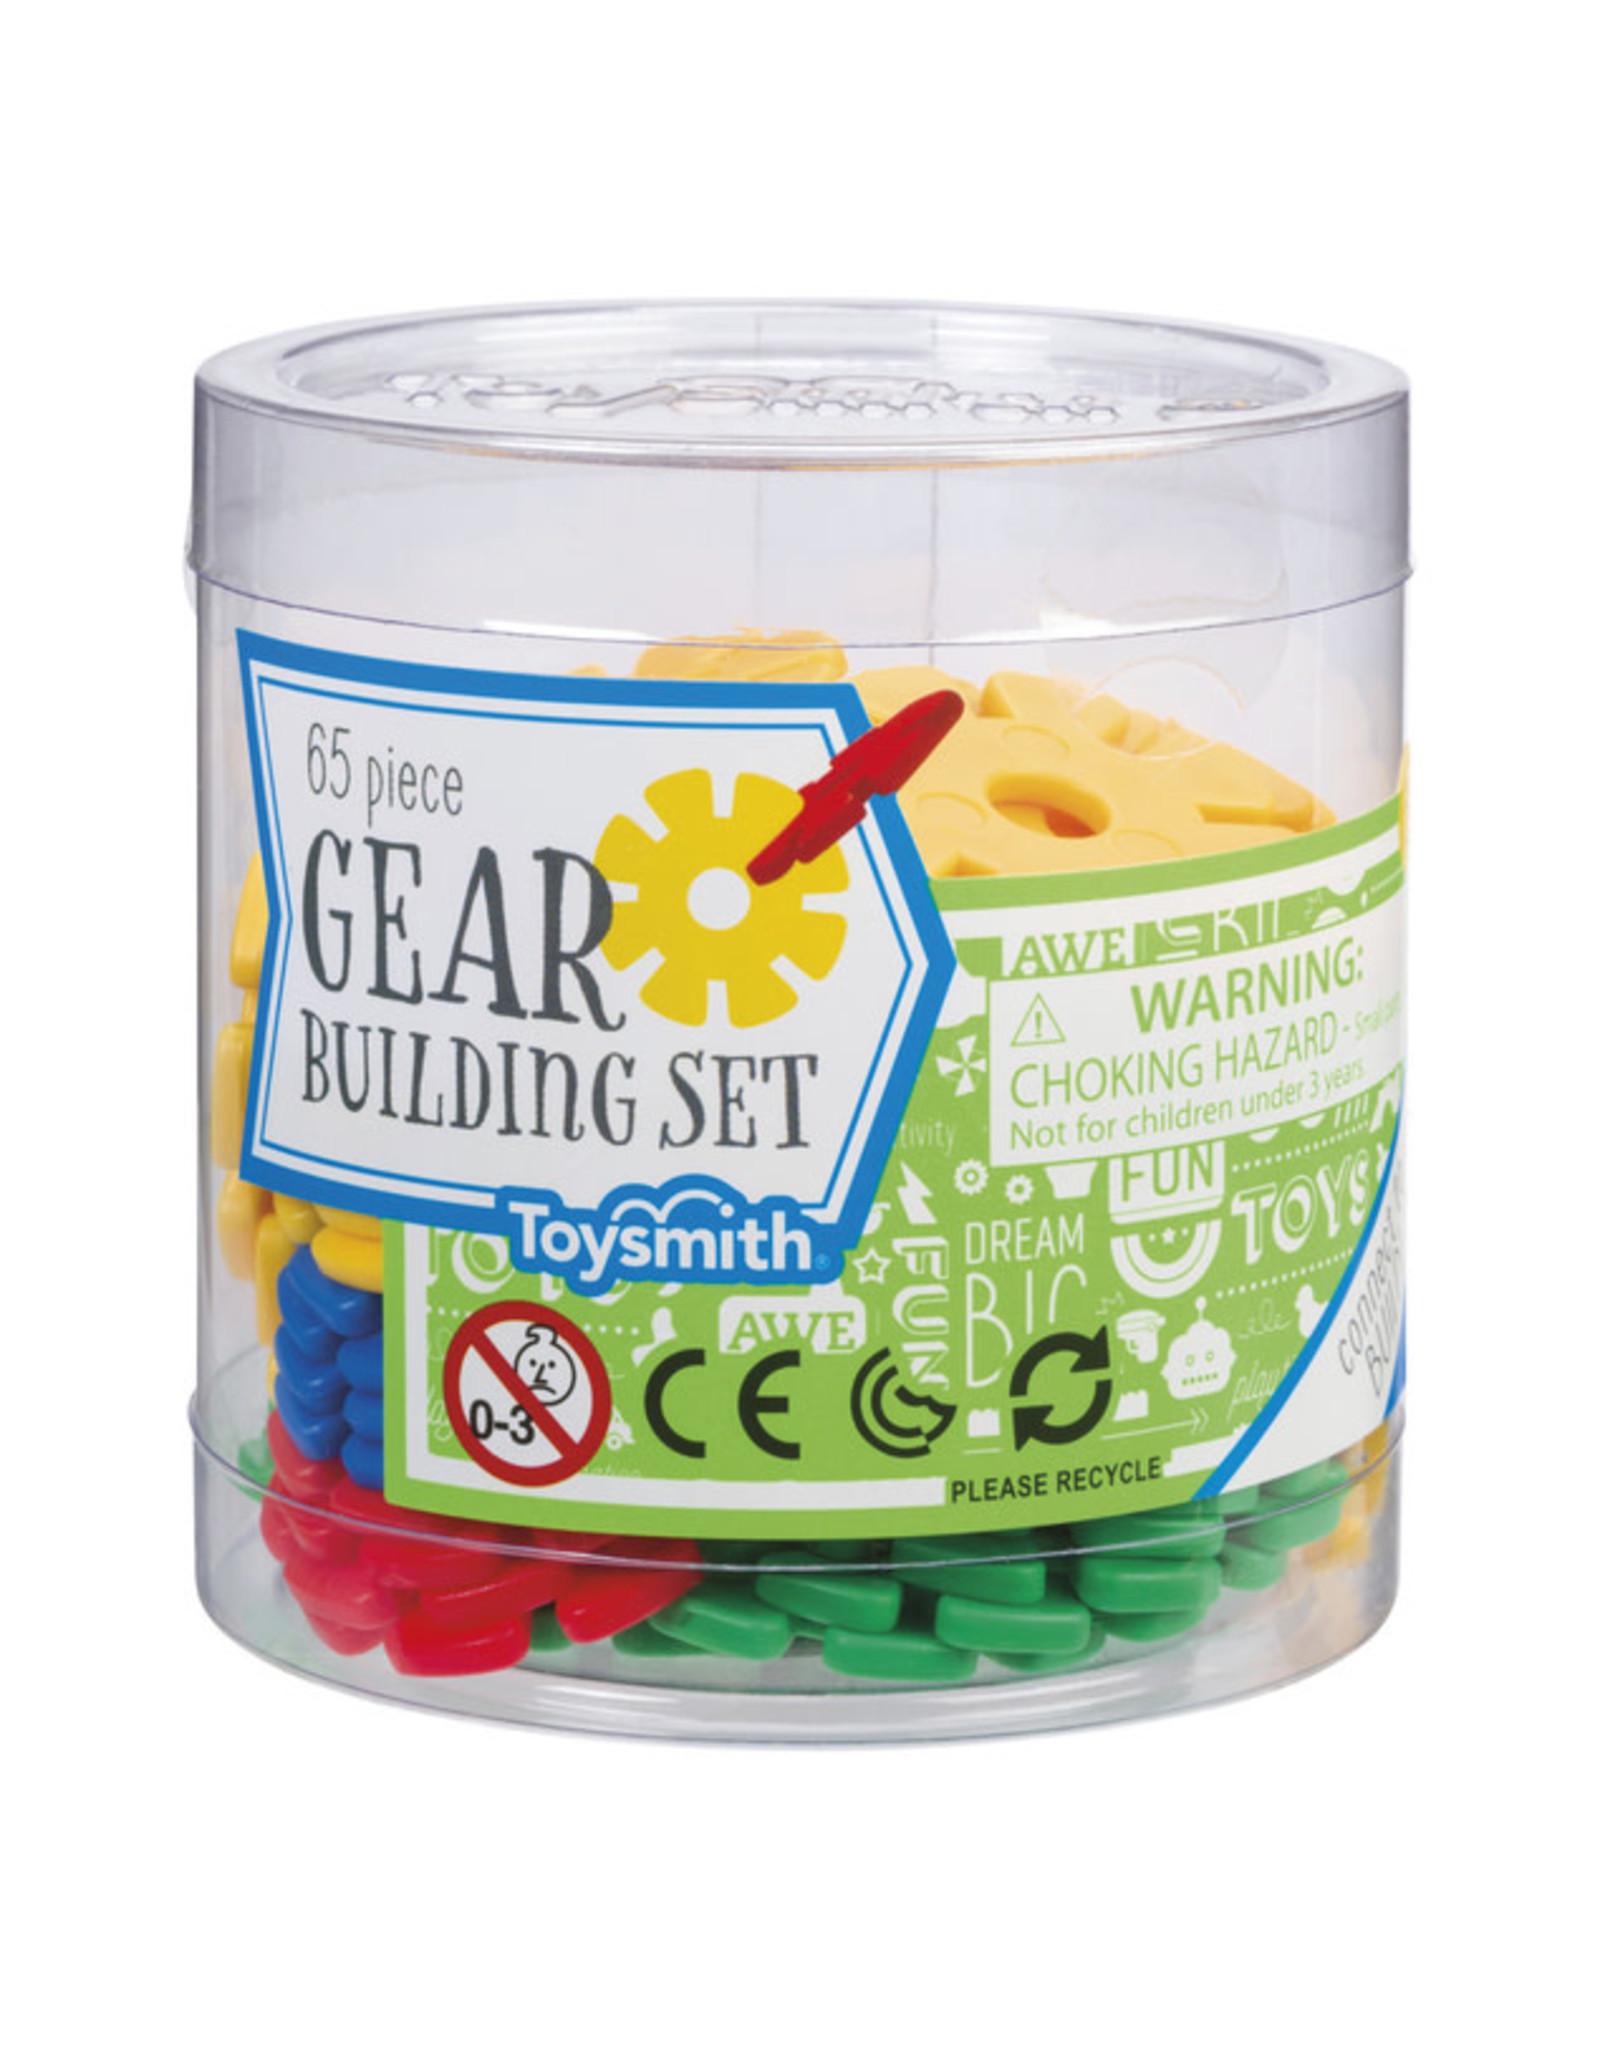 Toysmith Build a Gear Set